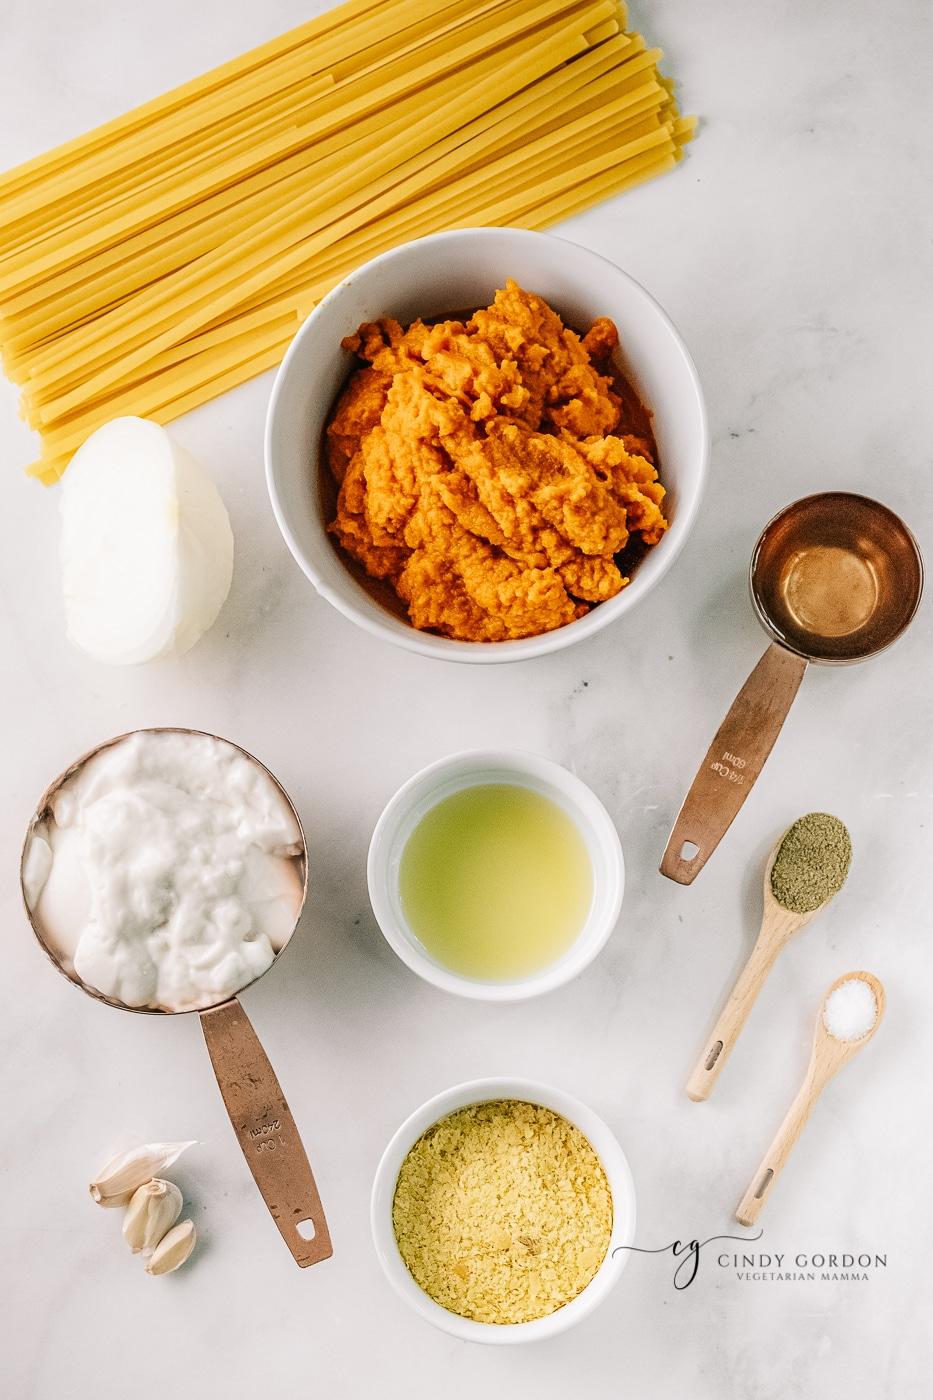 Ingredients for vegan pumpkin alfredo, each in separate bowls on a marble countertop